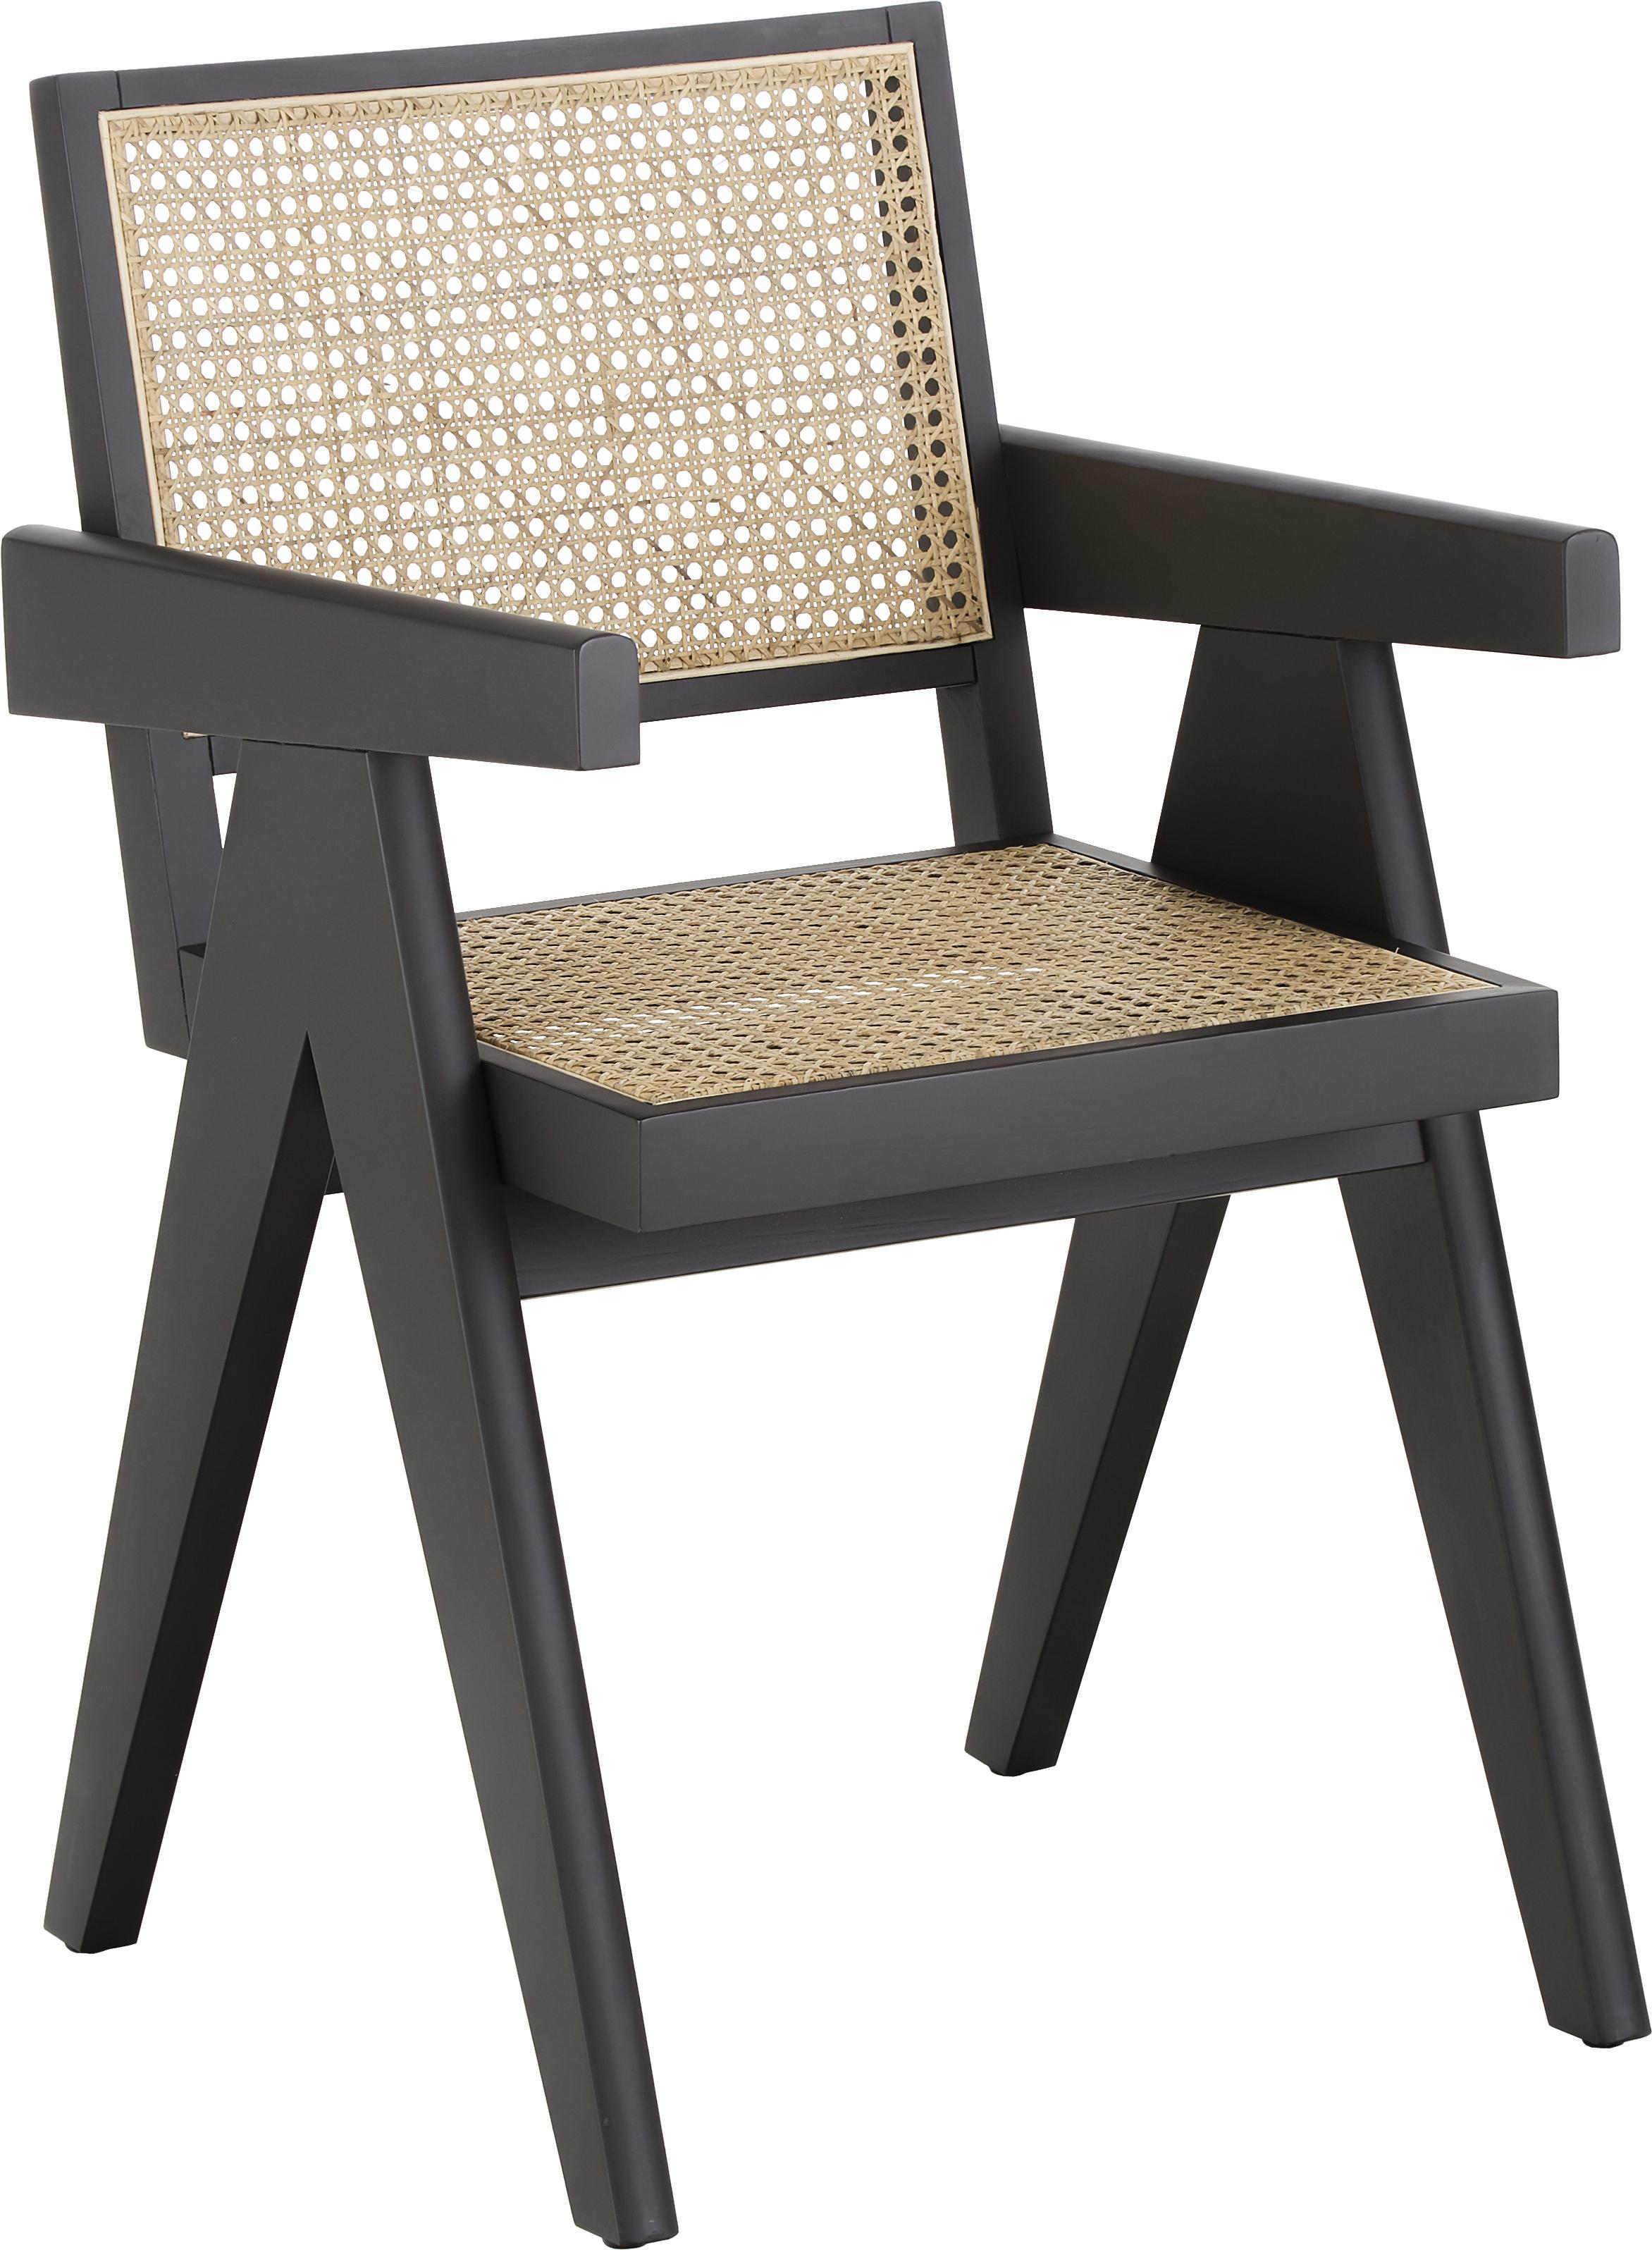 Silla con reposabrazos Sissi, Estructura: madera de haya maciza pin, Asiento: ratán, Ratán, negro, An 52 x F 58 cm